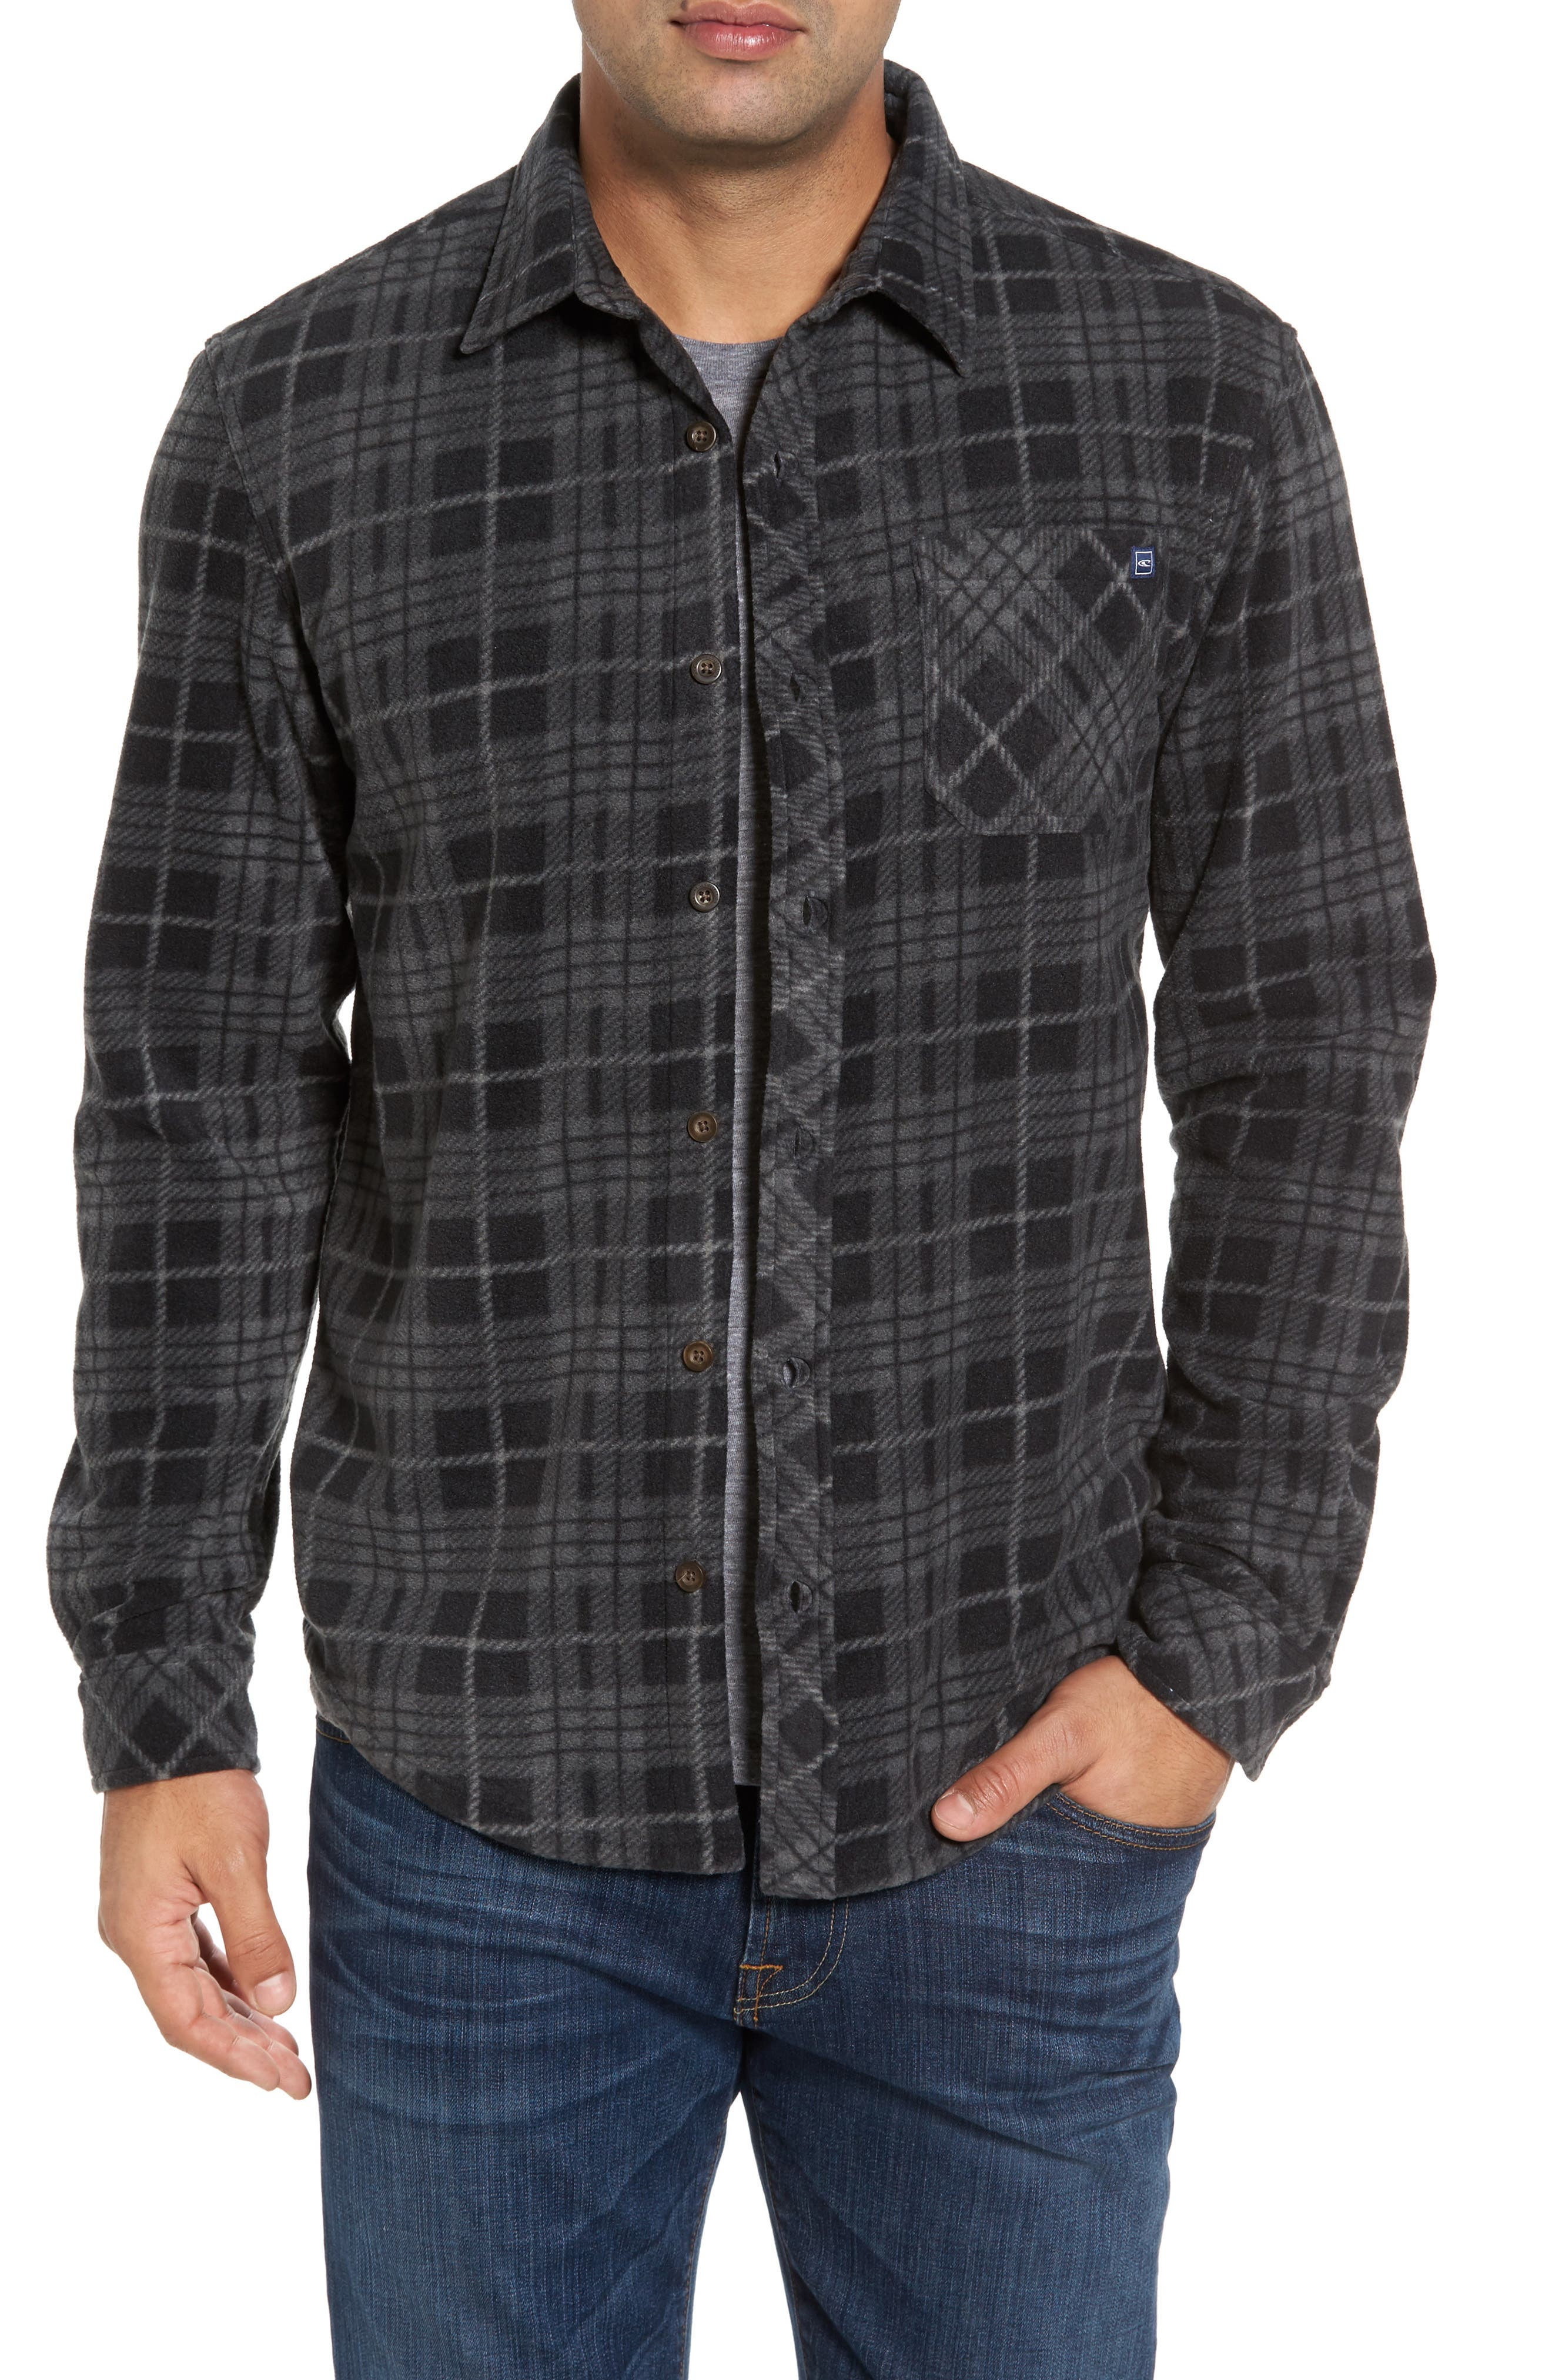 Breakers Regular Fit Plaid Fleece Shirt,                             Main thumbnail 1, color,                             001